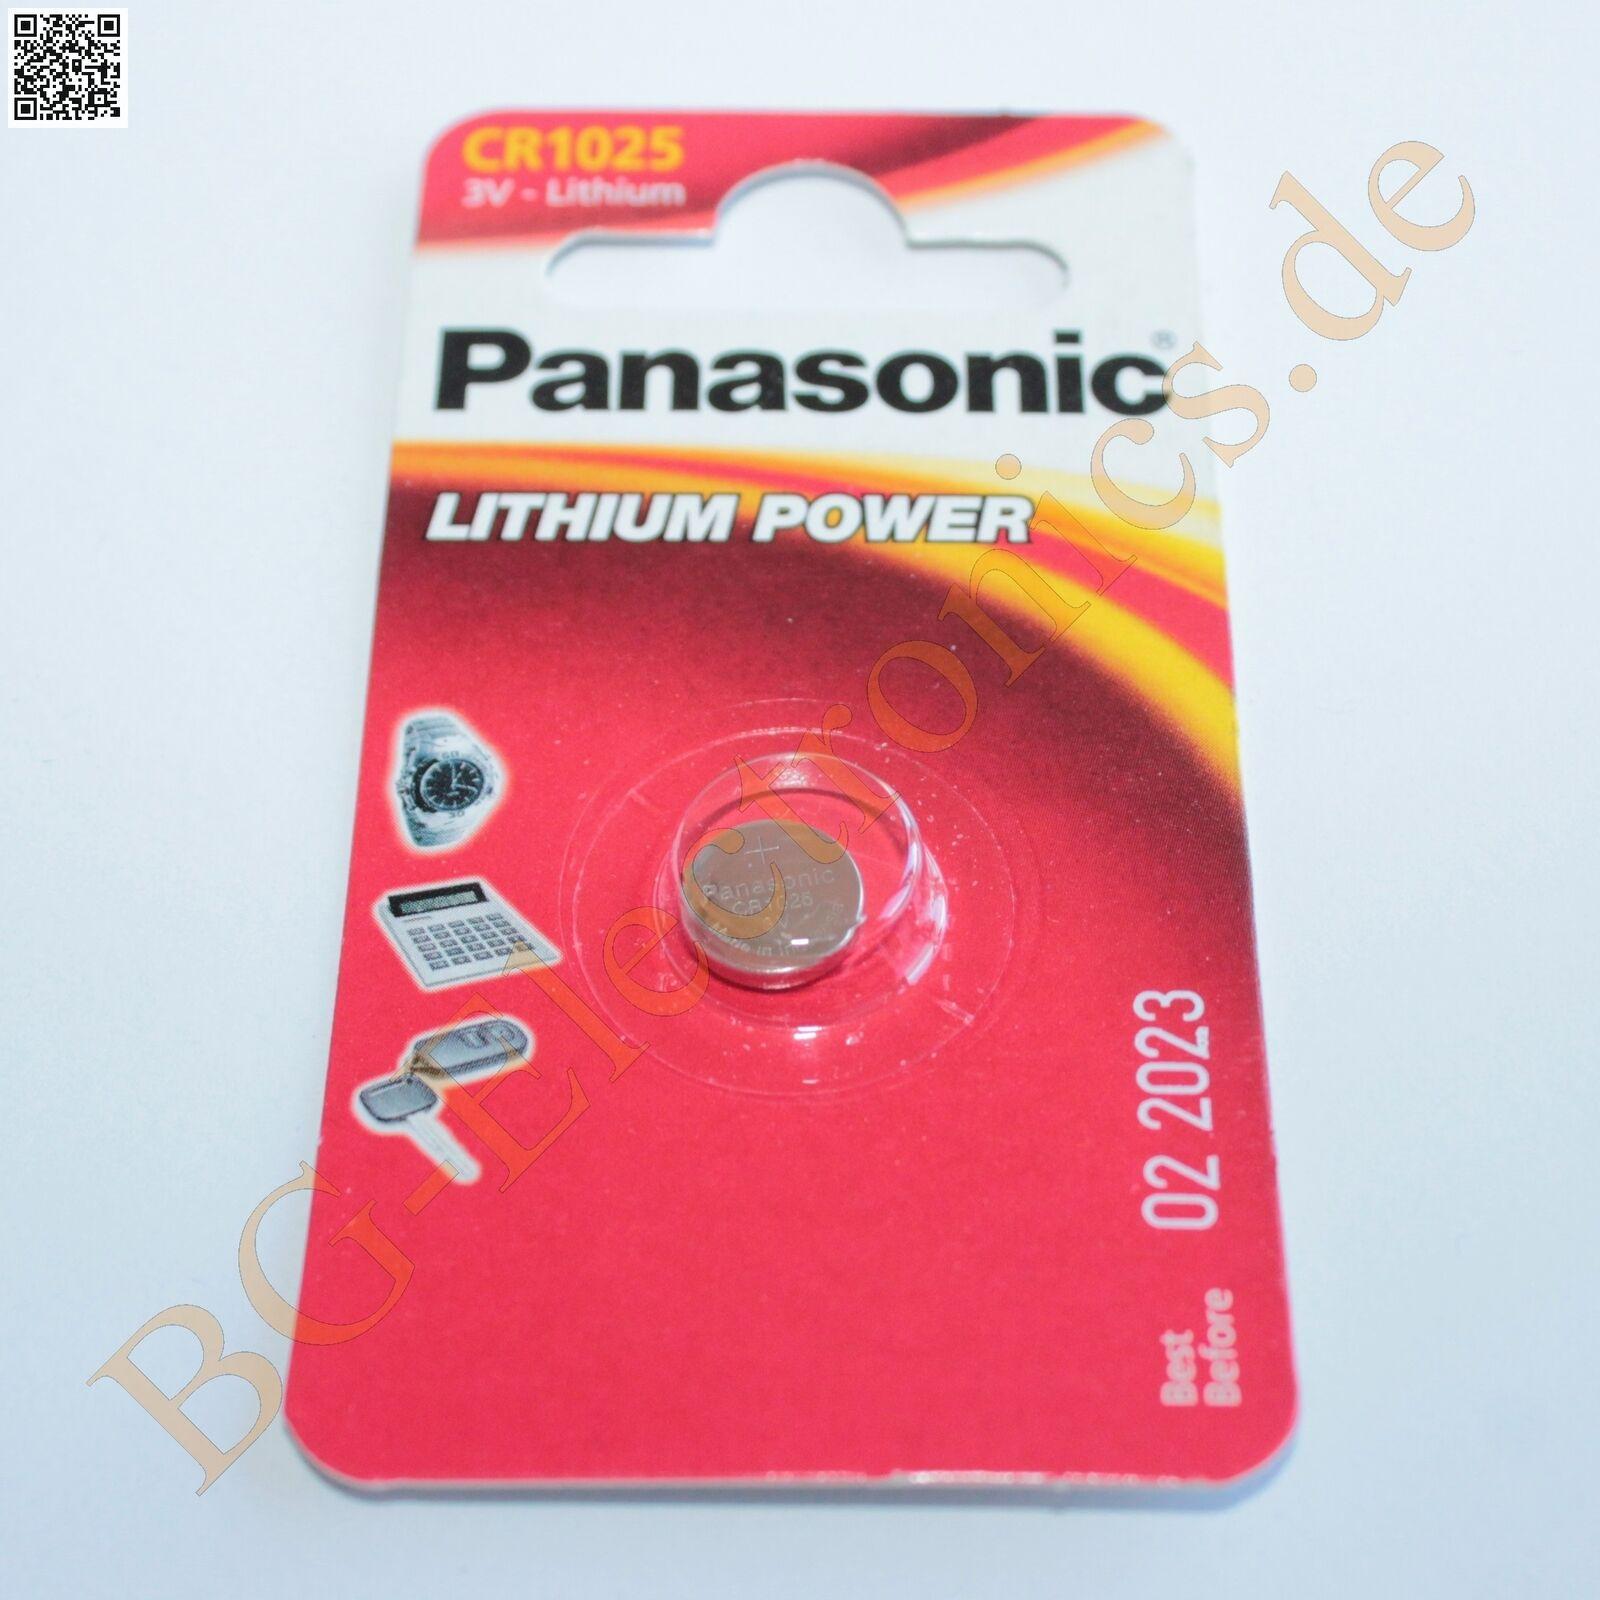 2 x CR1025 Lithium Power Battery 2.5mm 10mm 3V Panasonic Coin Cell 2pcs